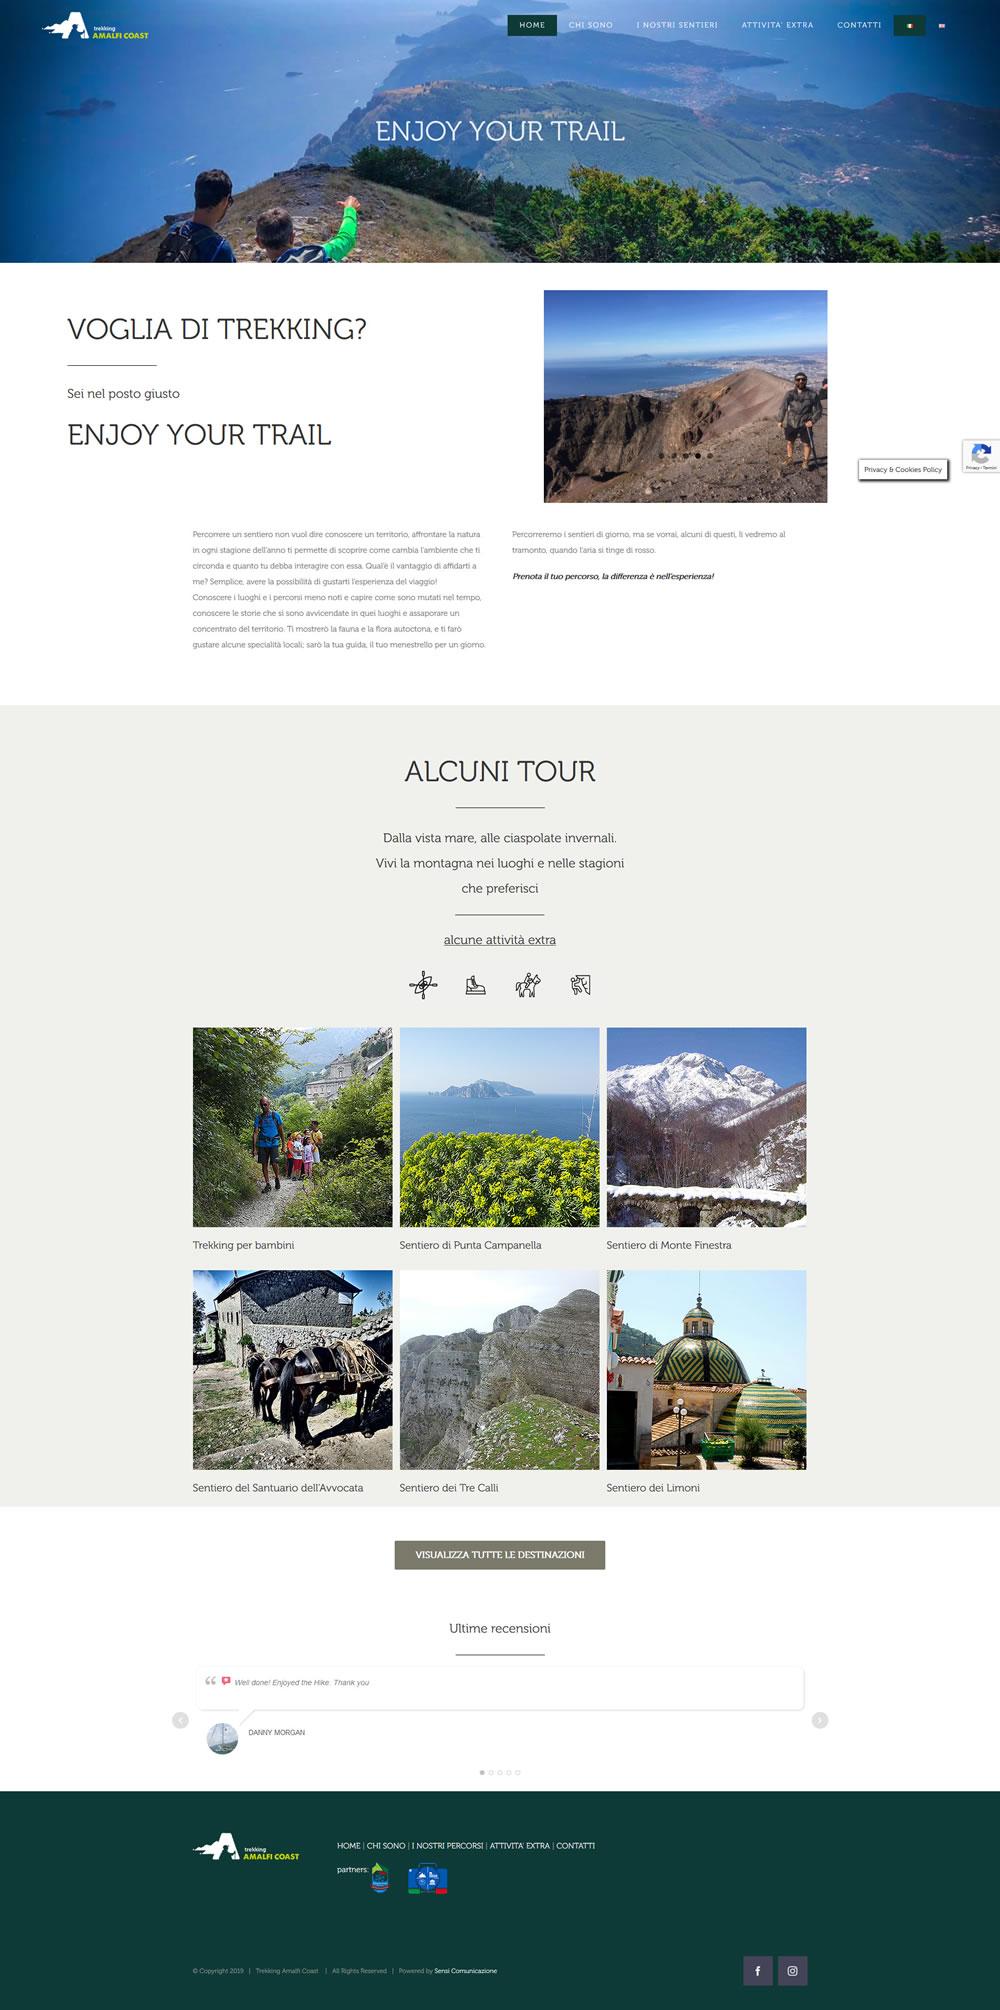 Trekking Amalfi Coast, Guida Ambientale Escursionistica - Setteweb.it Portfolio Sito Web WordPress 7Web-2019